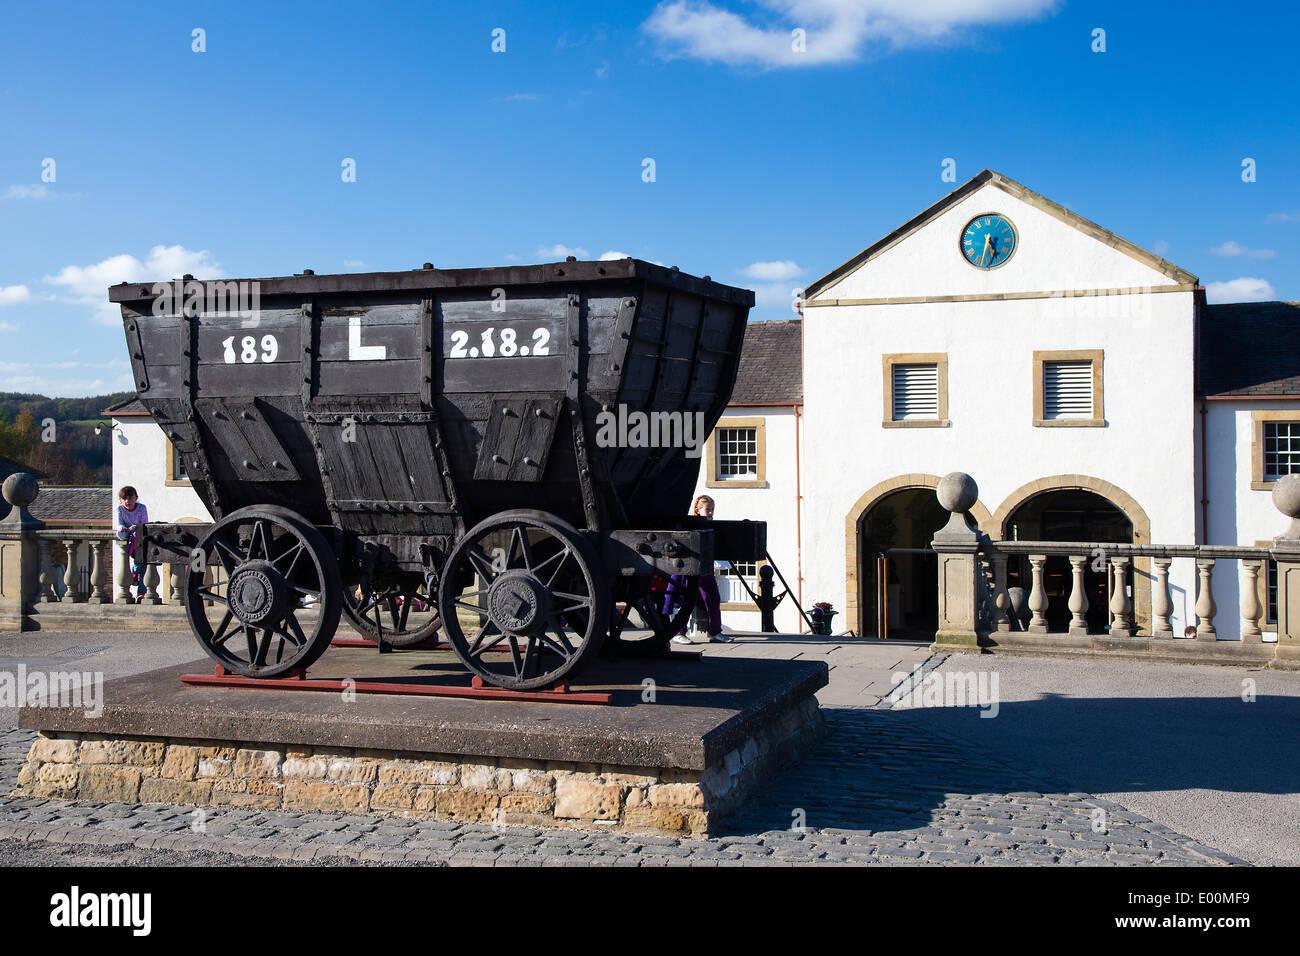 Beamish Museum Entrance, County Durham, England - Stock Image